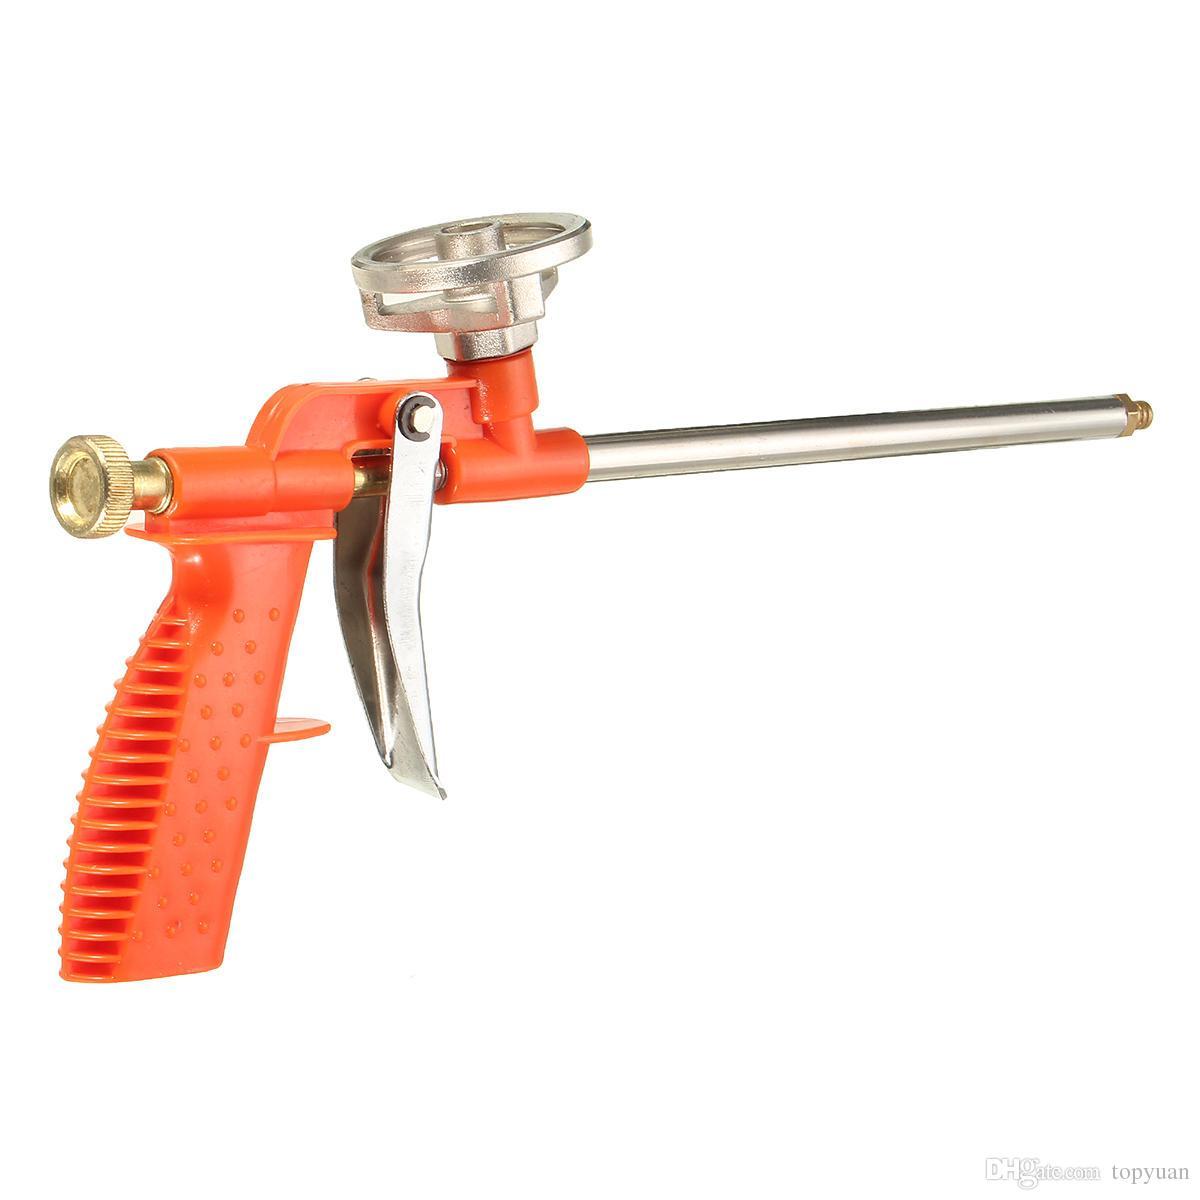 Stainless Steel Material Foam Expanding Spray Gun Sealant Dispensing PU Insul...